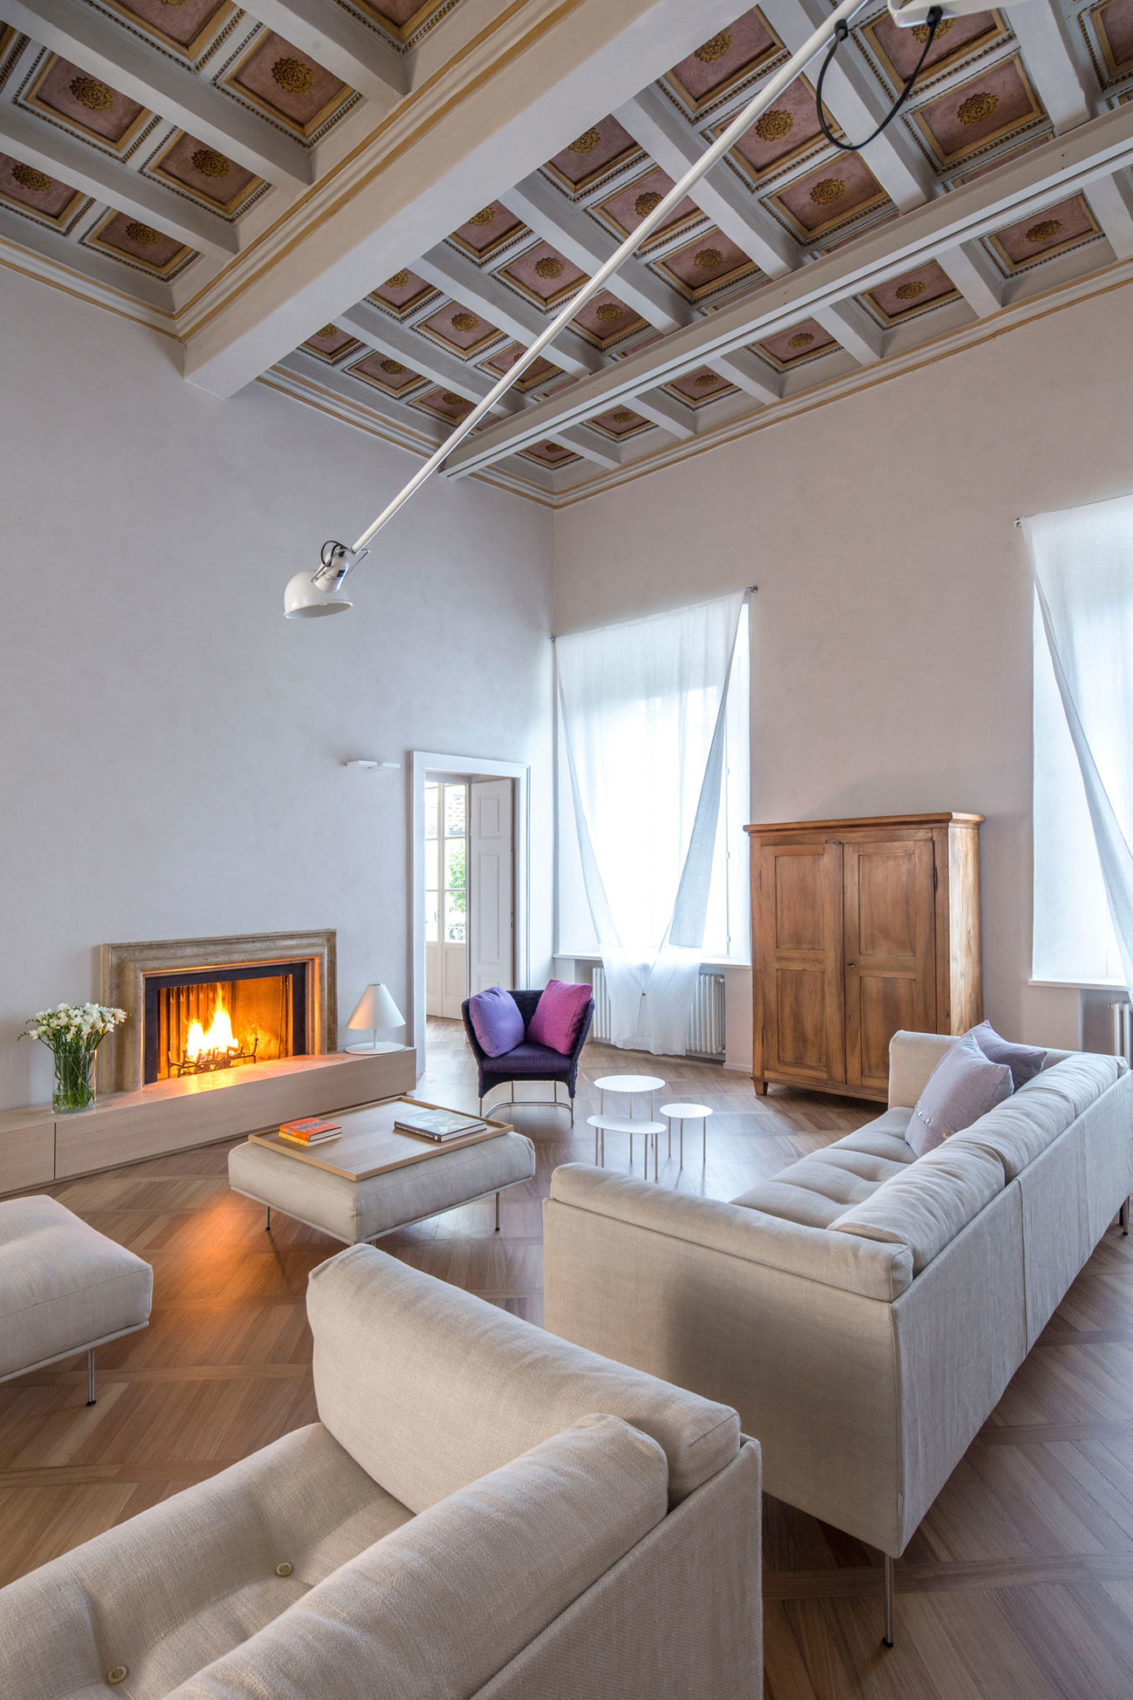 Apartment in Piacenza by Studio Blesi Subitoni (3)